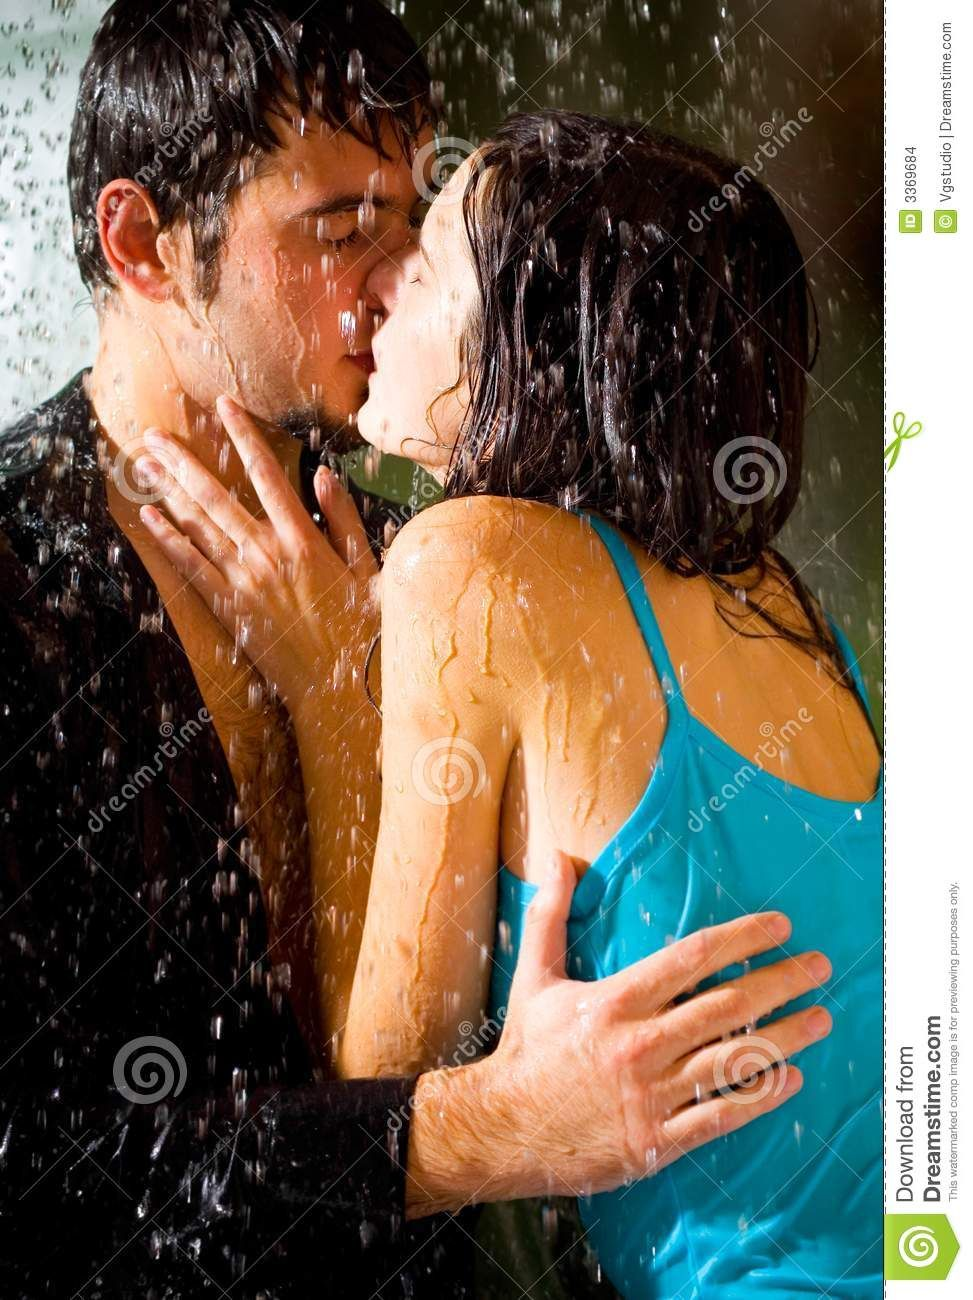 bading ang dating besplatno preuzimanje